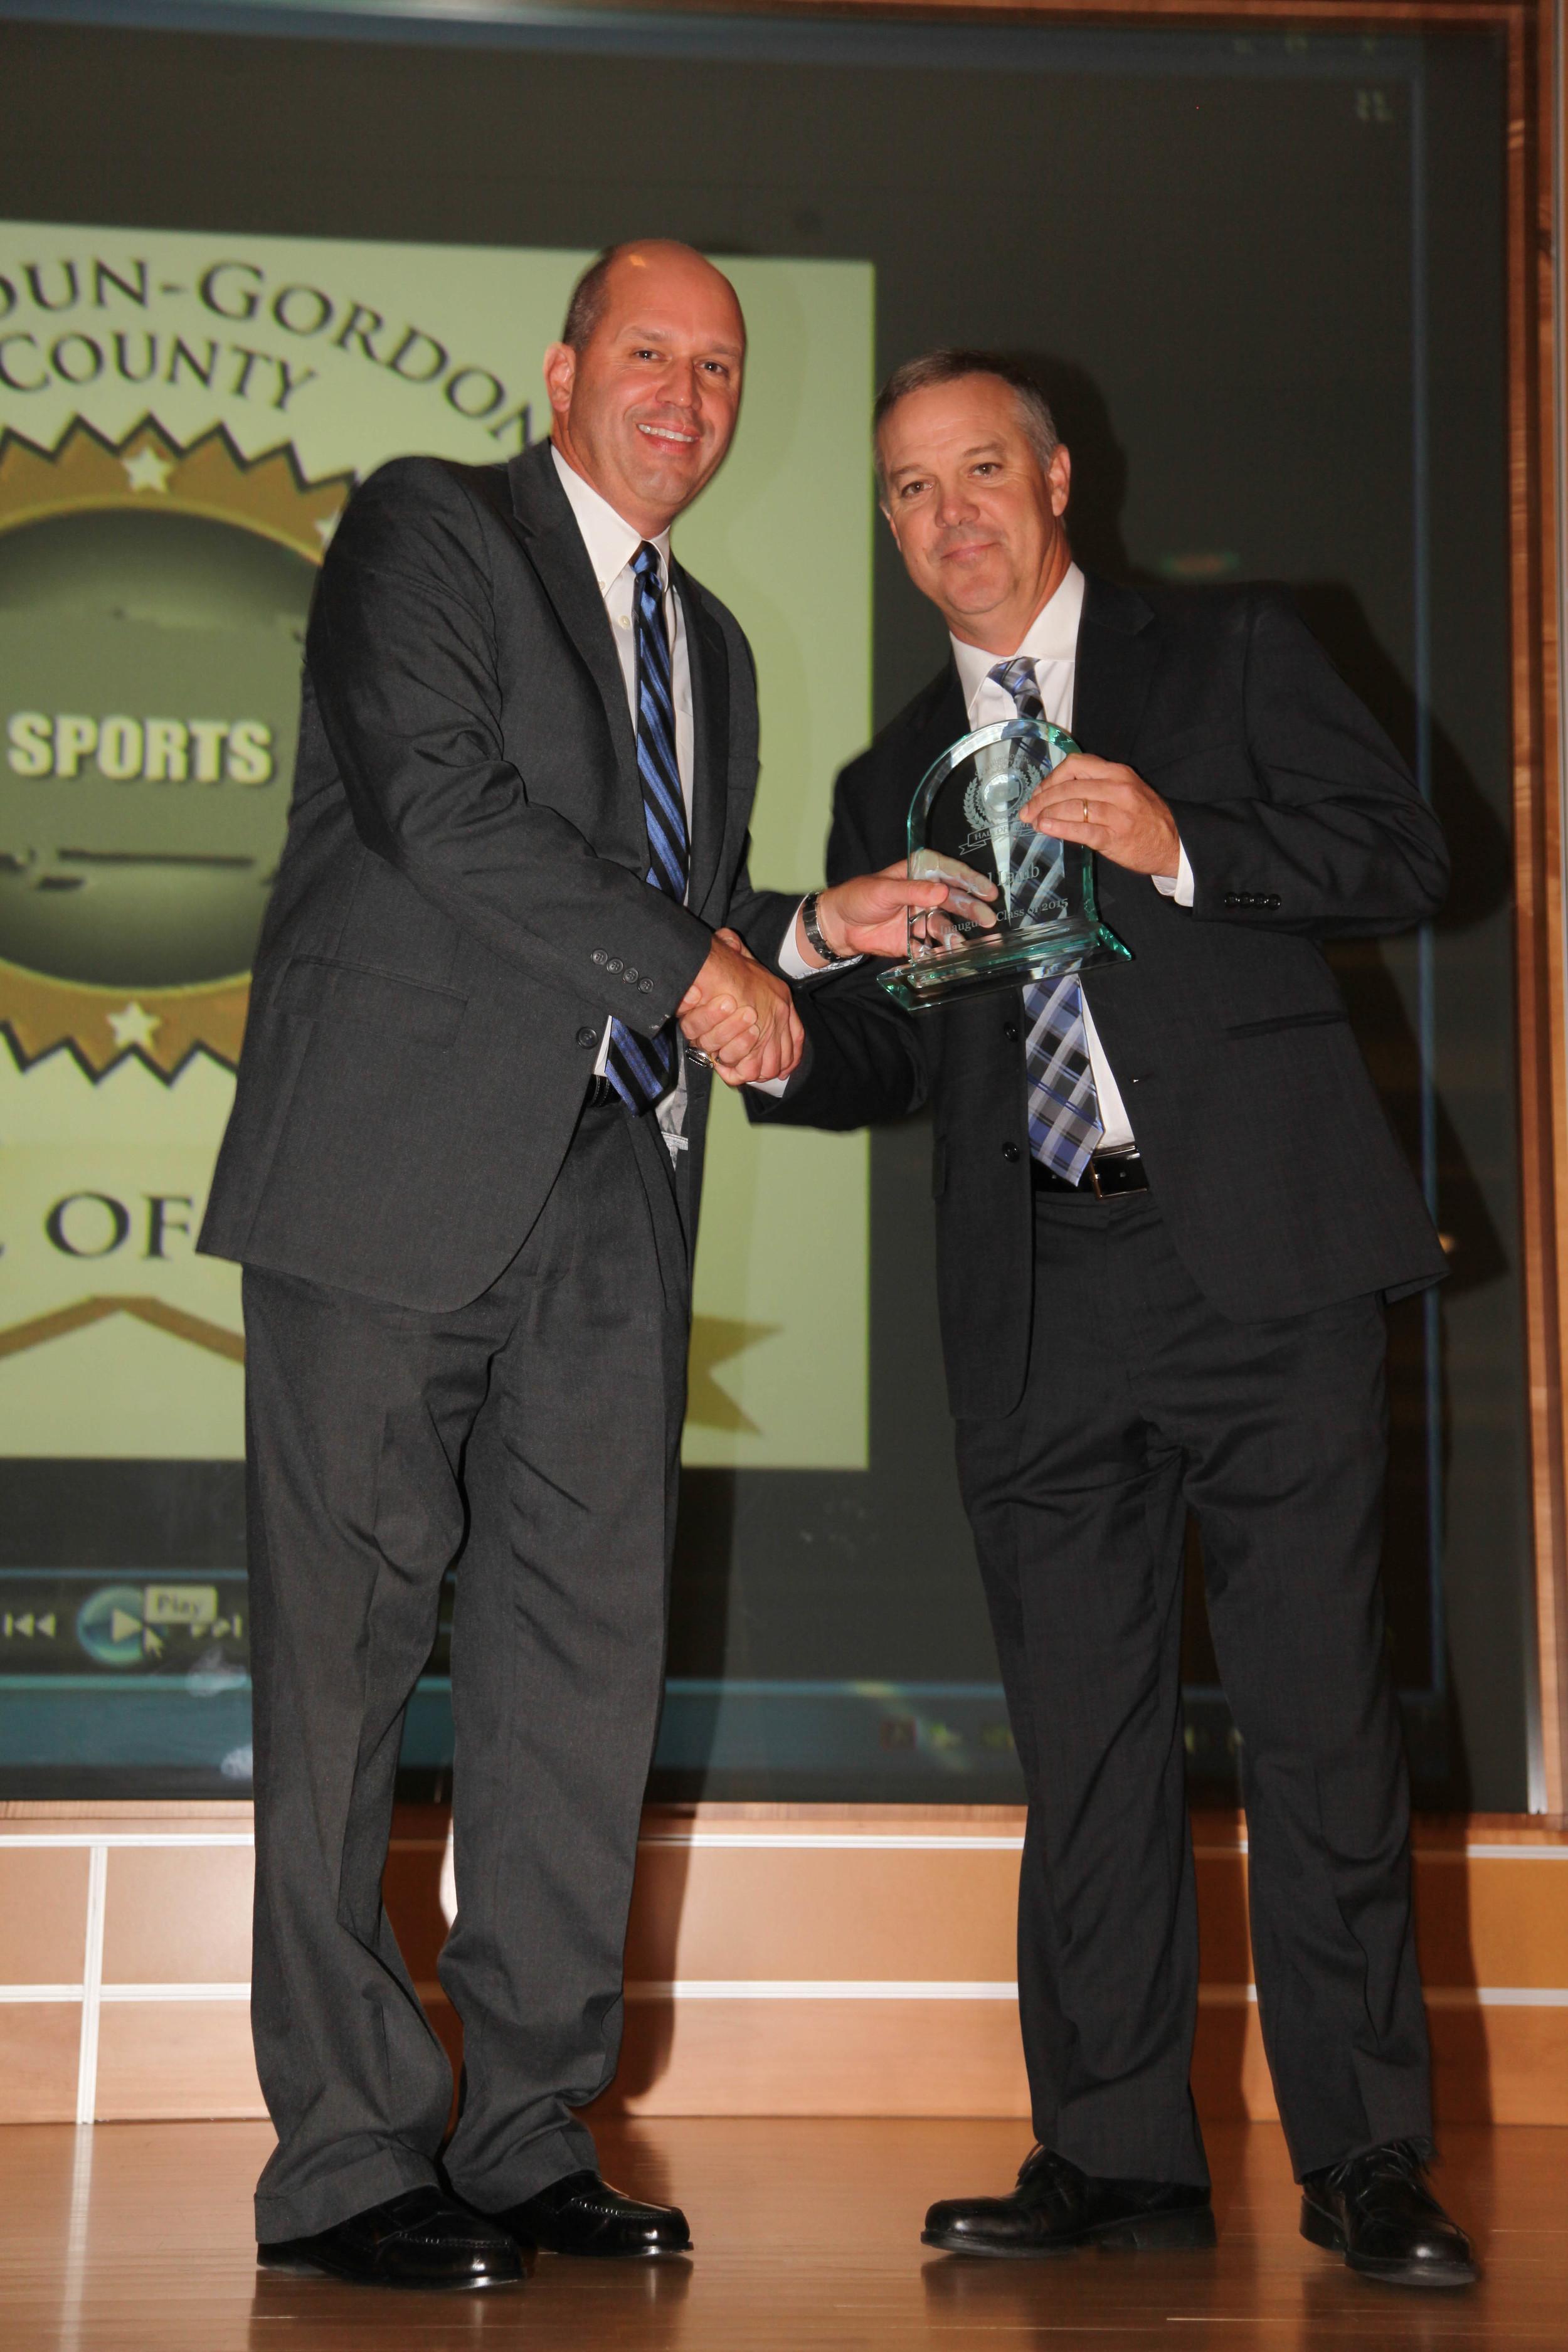 Calhoun-Gordon-County-Sports-Hall-of-Fame-2015-112.jpg